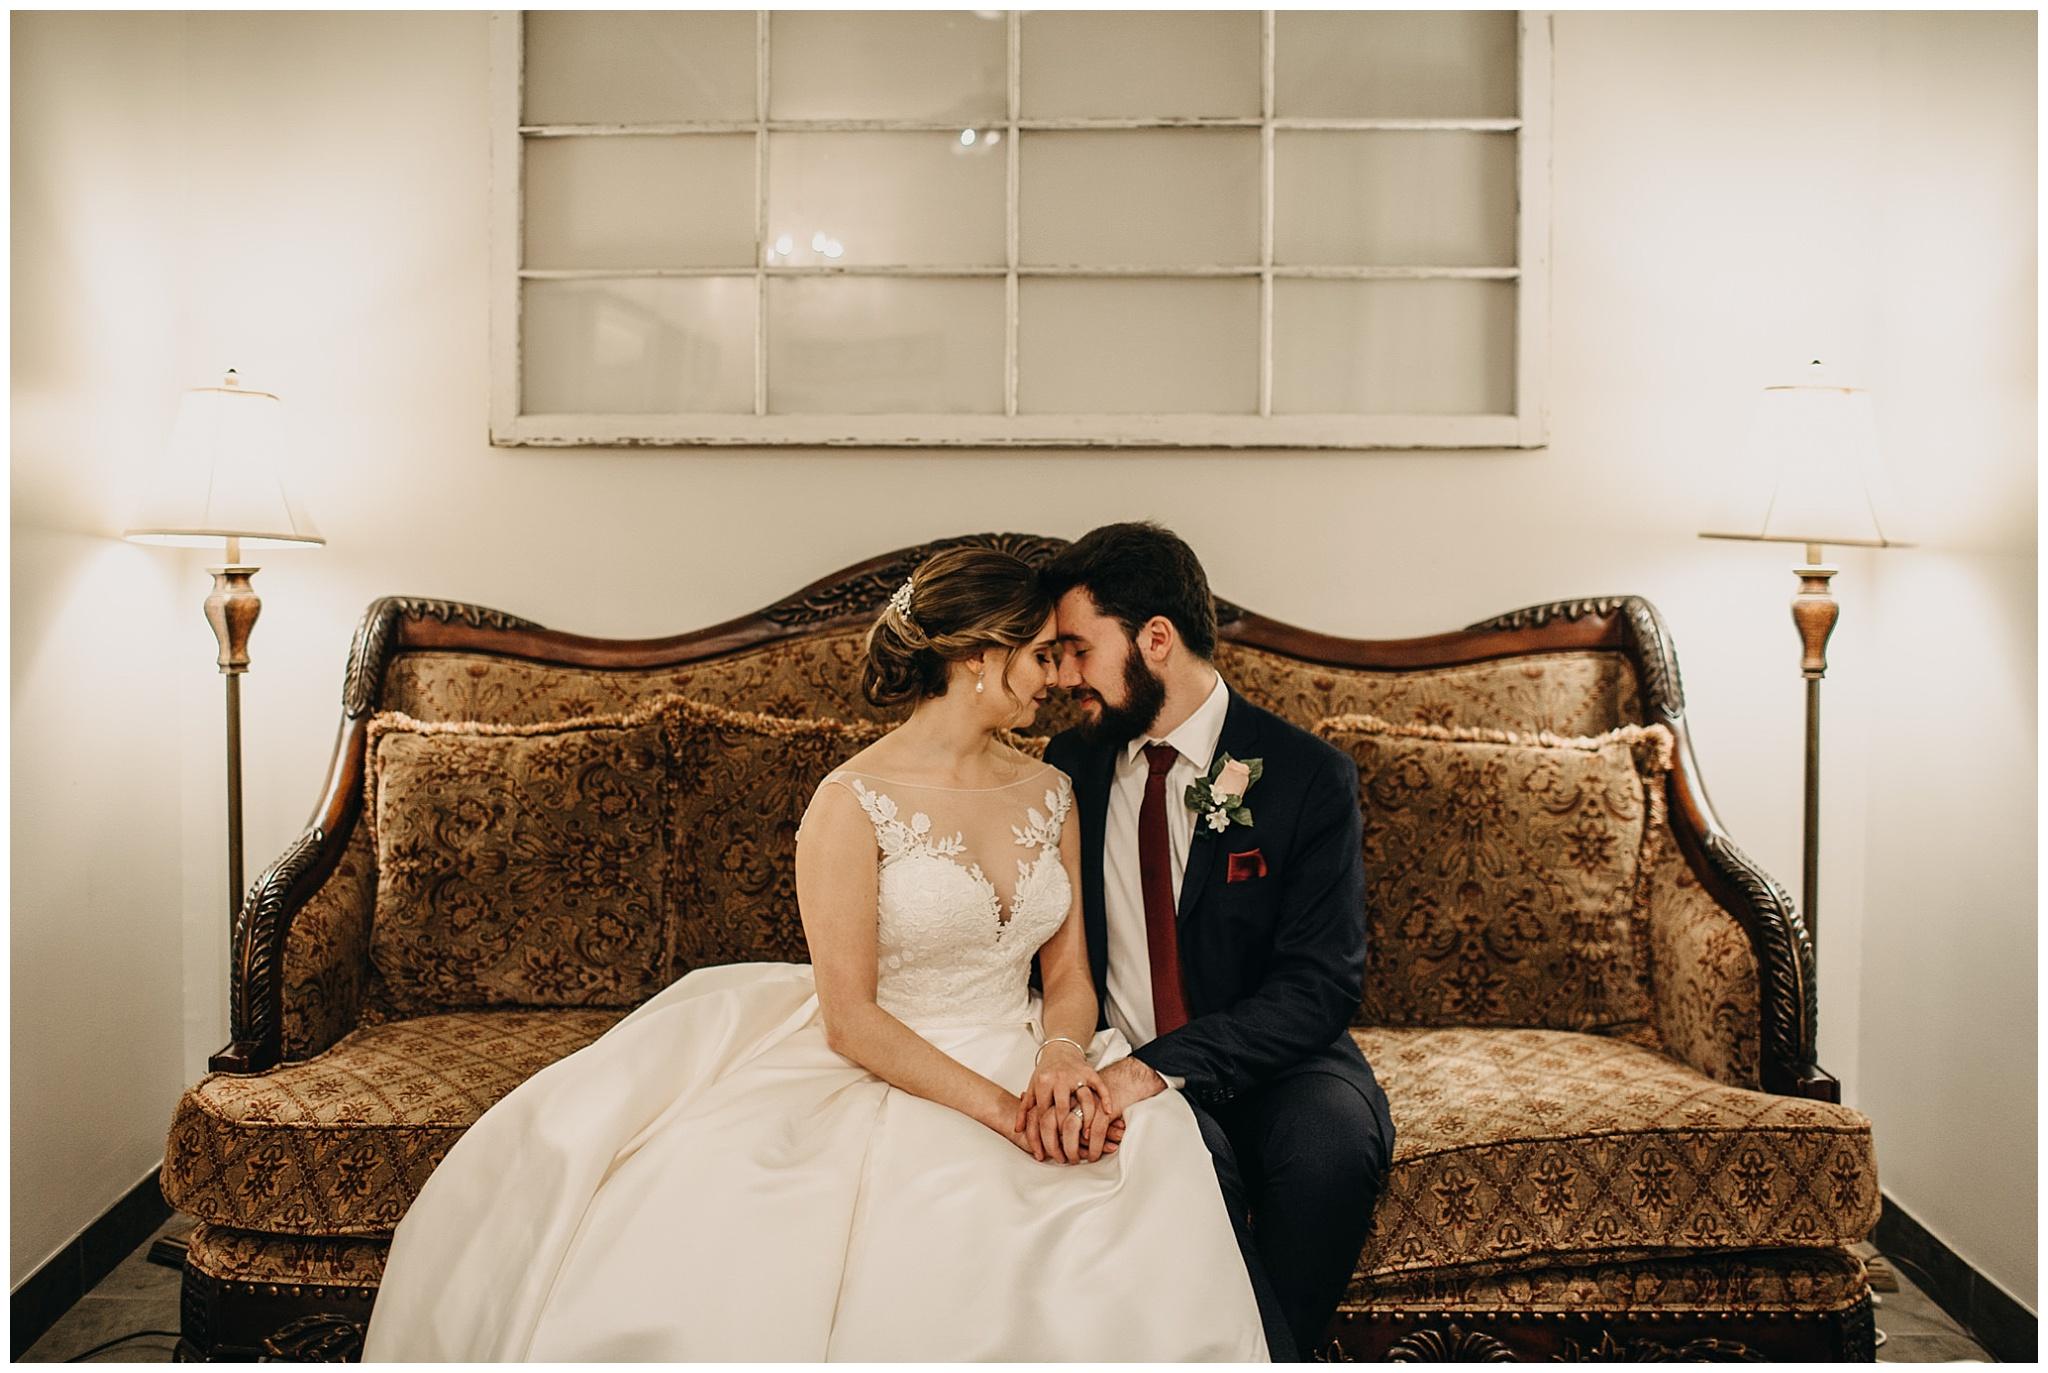 bride and groom portrait in bridal suite at fraser river lodge wedding